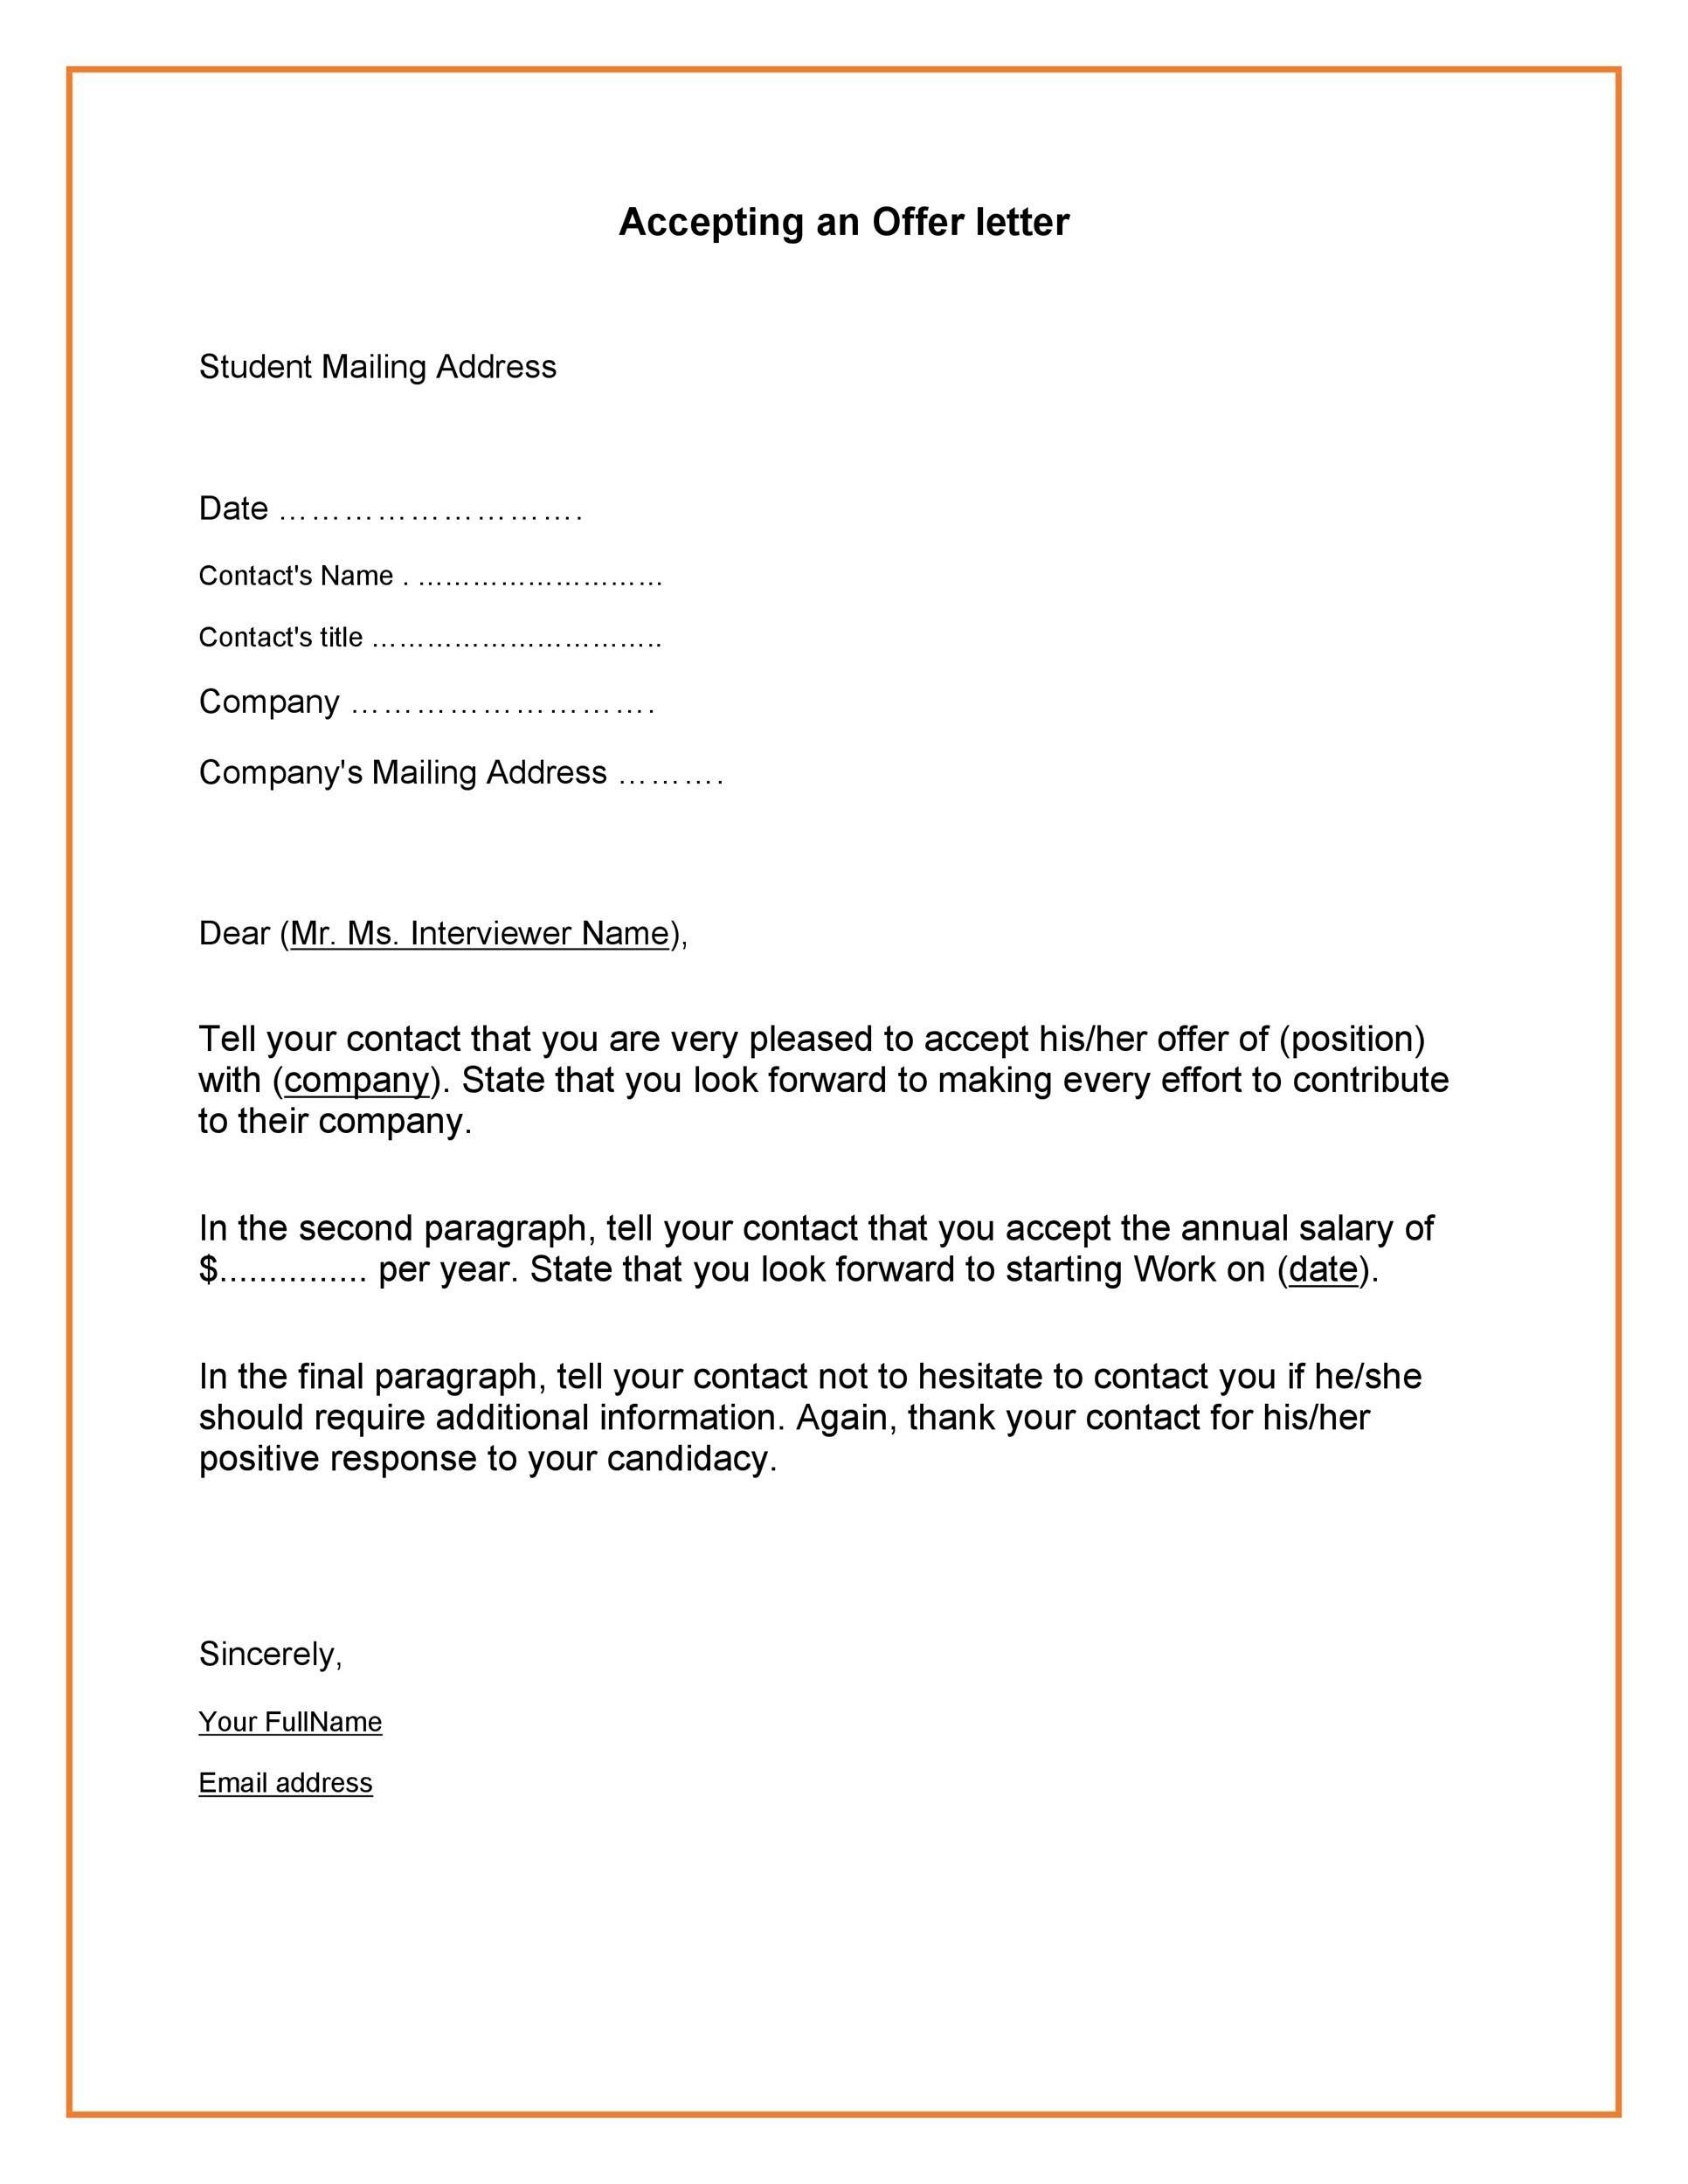 40 Professional Job Offer Acceptance Letter  Email